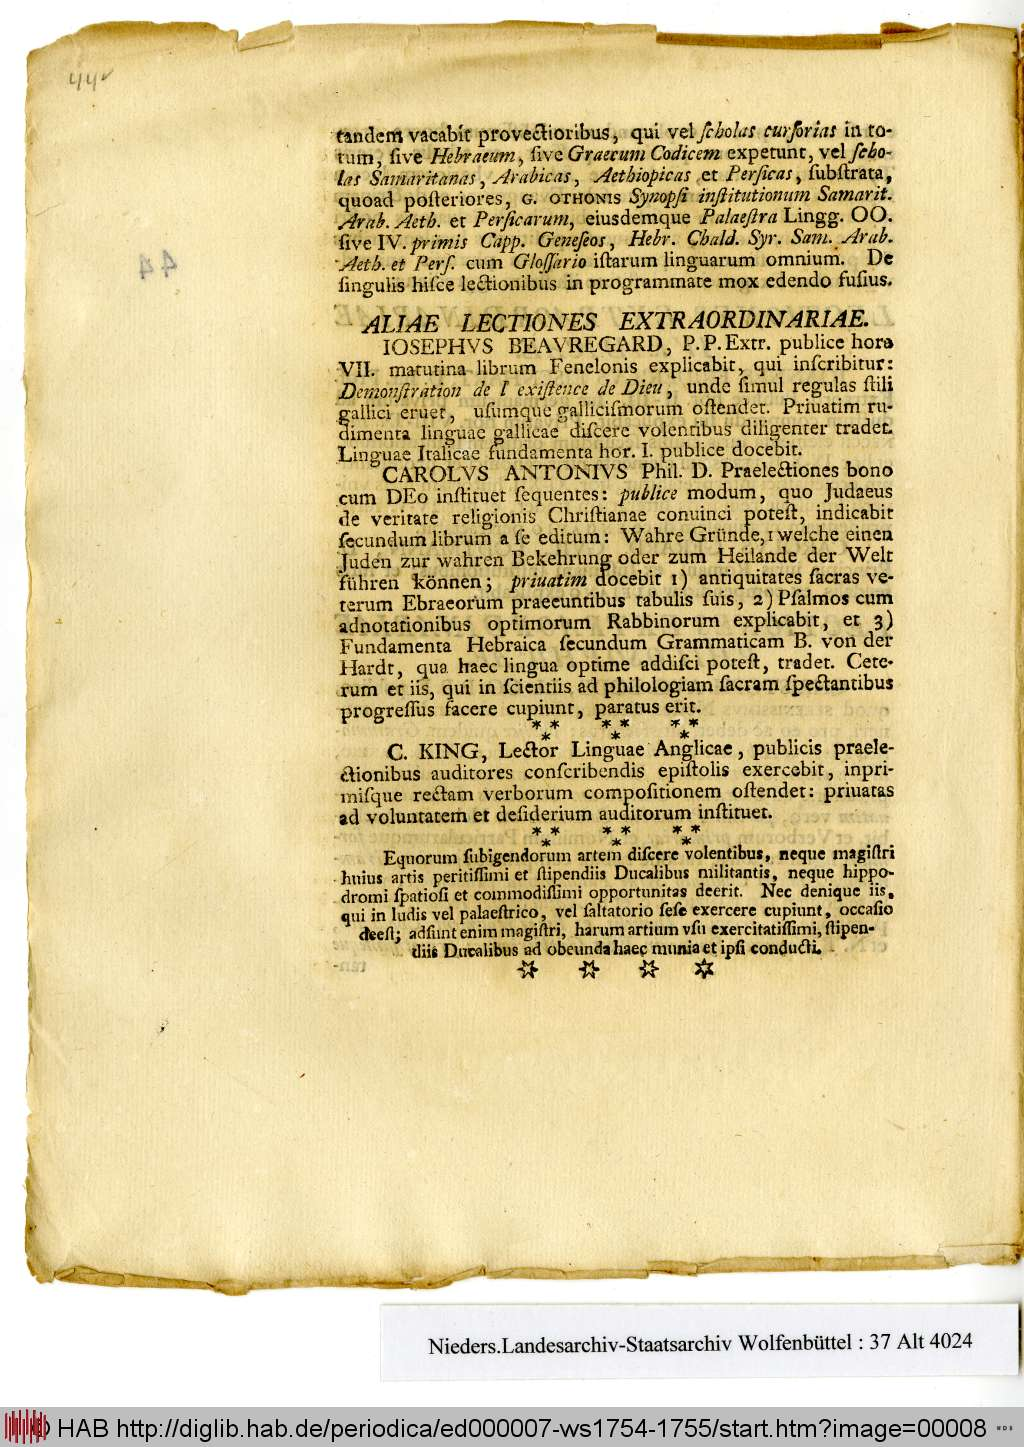 https://diglib.hab.de/periodica/ed000007-ws1754-1755/00008.jpg